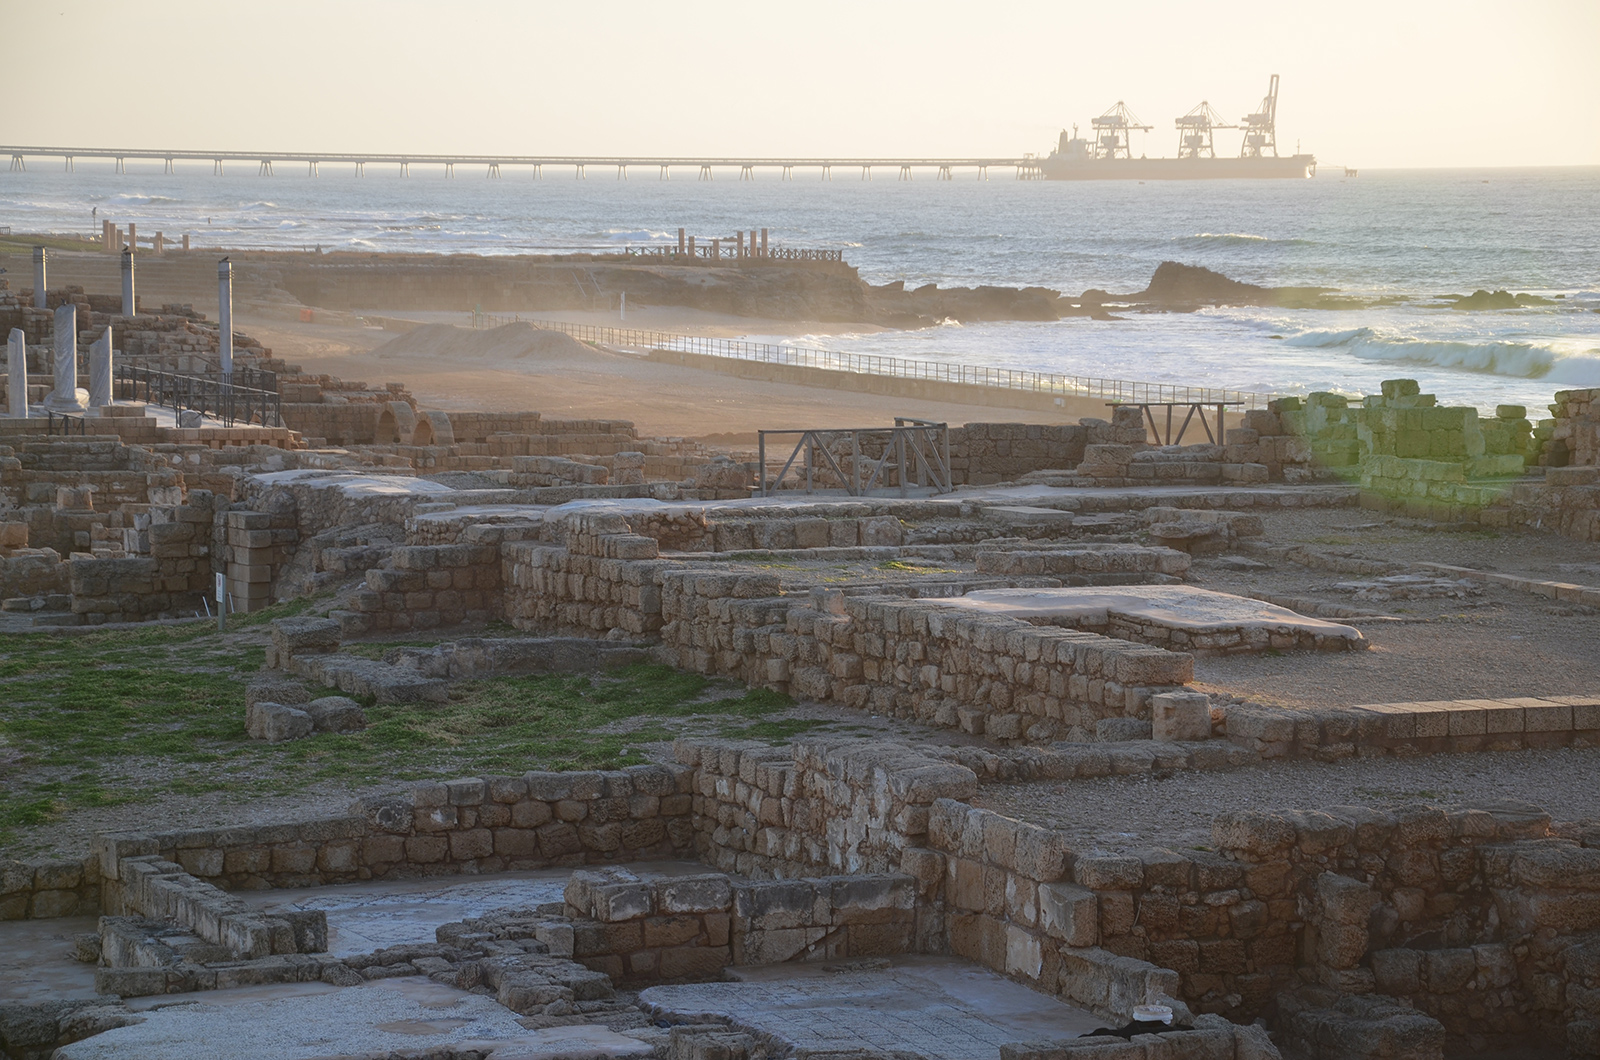 hlavní atrakce města Caesarea, Izrael